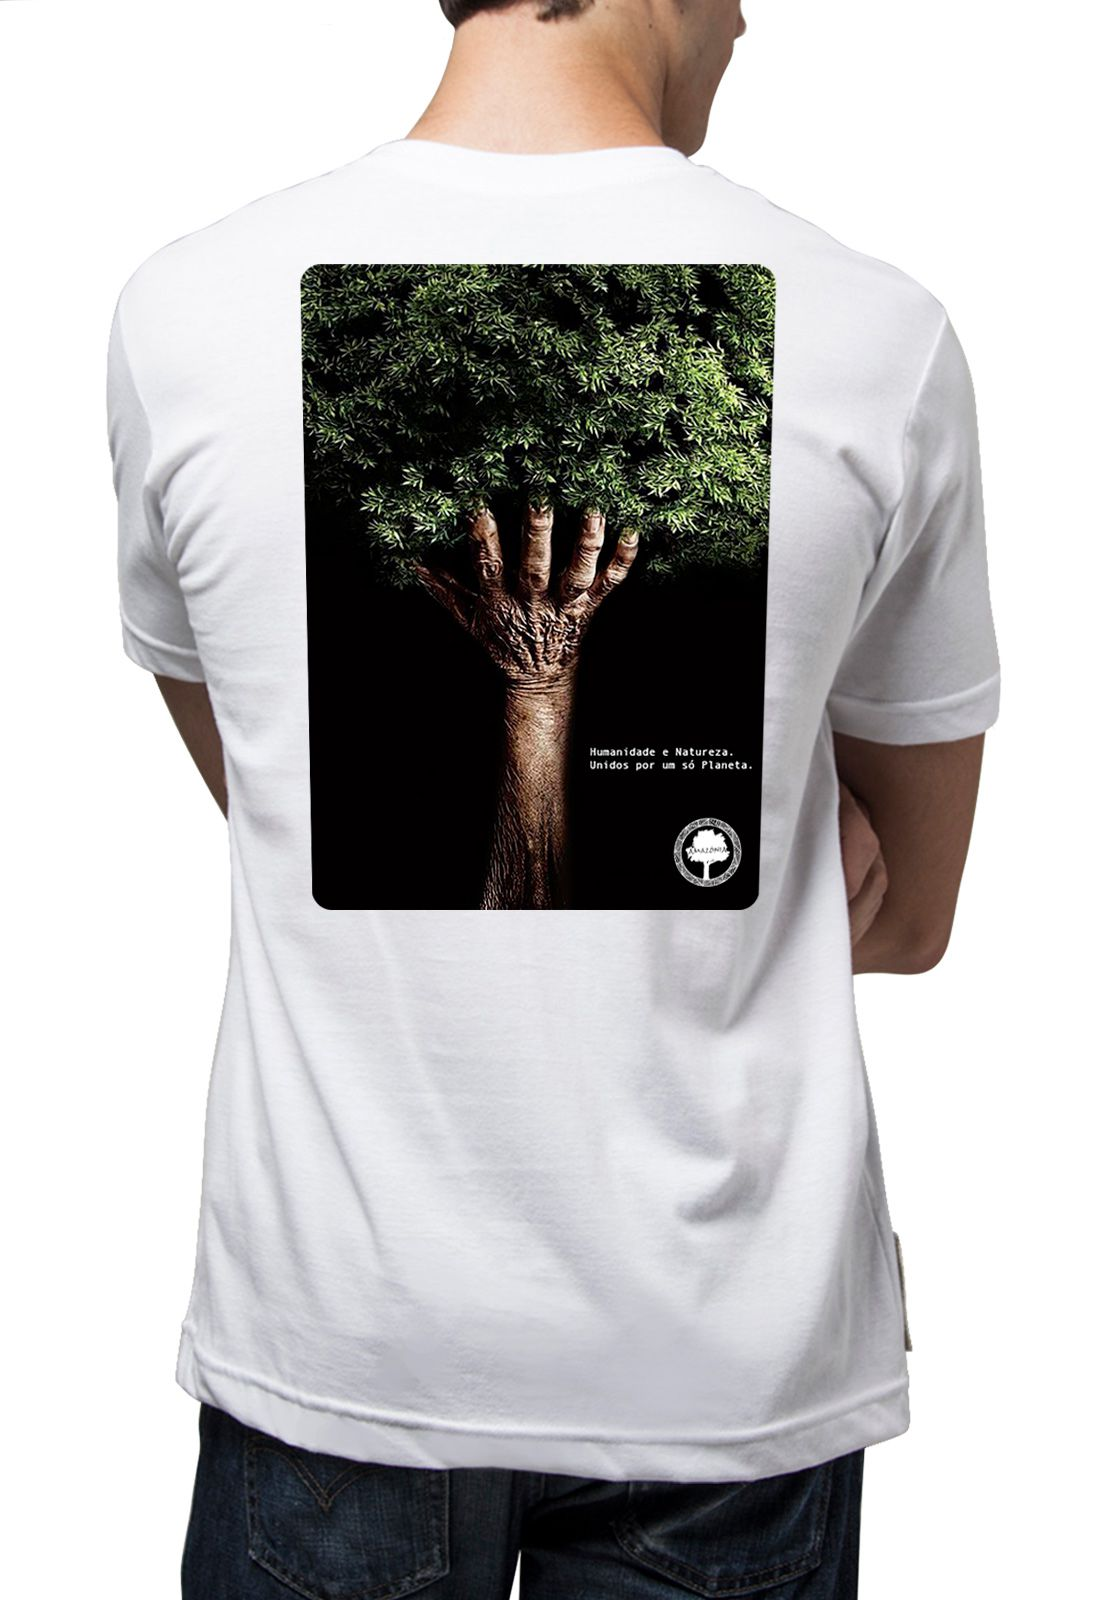 Camiseta Amazônia Humanidade + Natureza - Branco